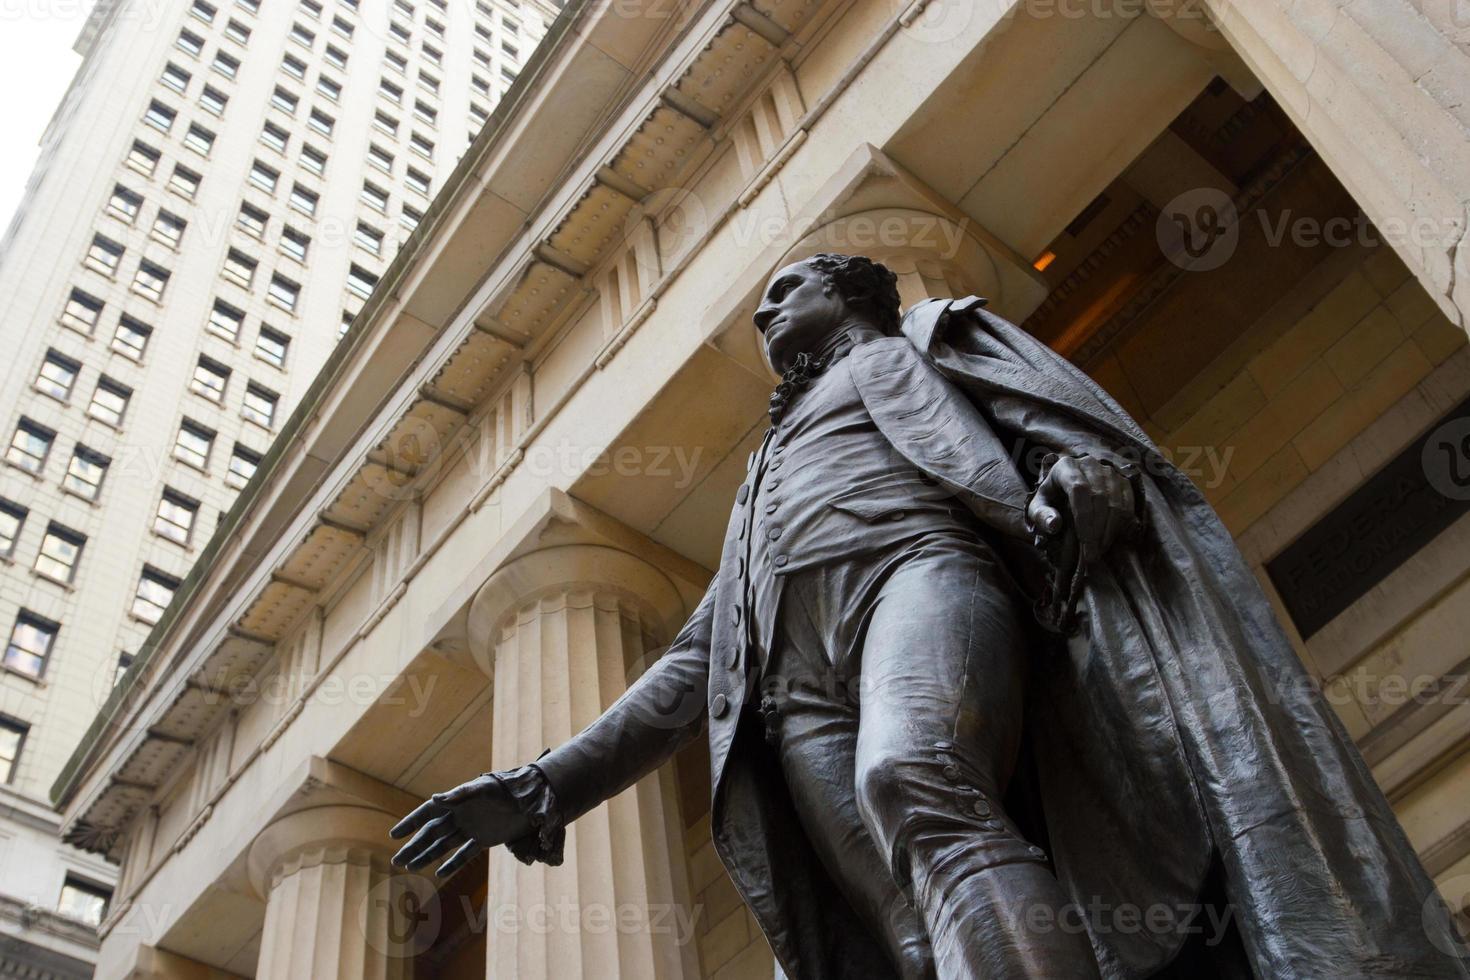 George Washington at the Federal Hall on Wall St., NY photo